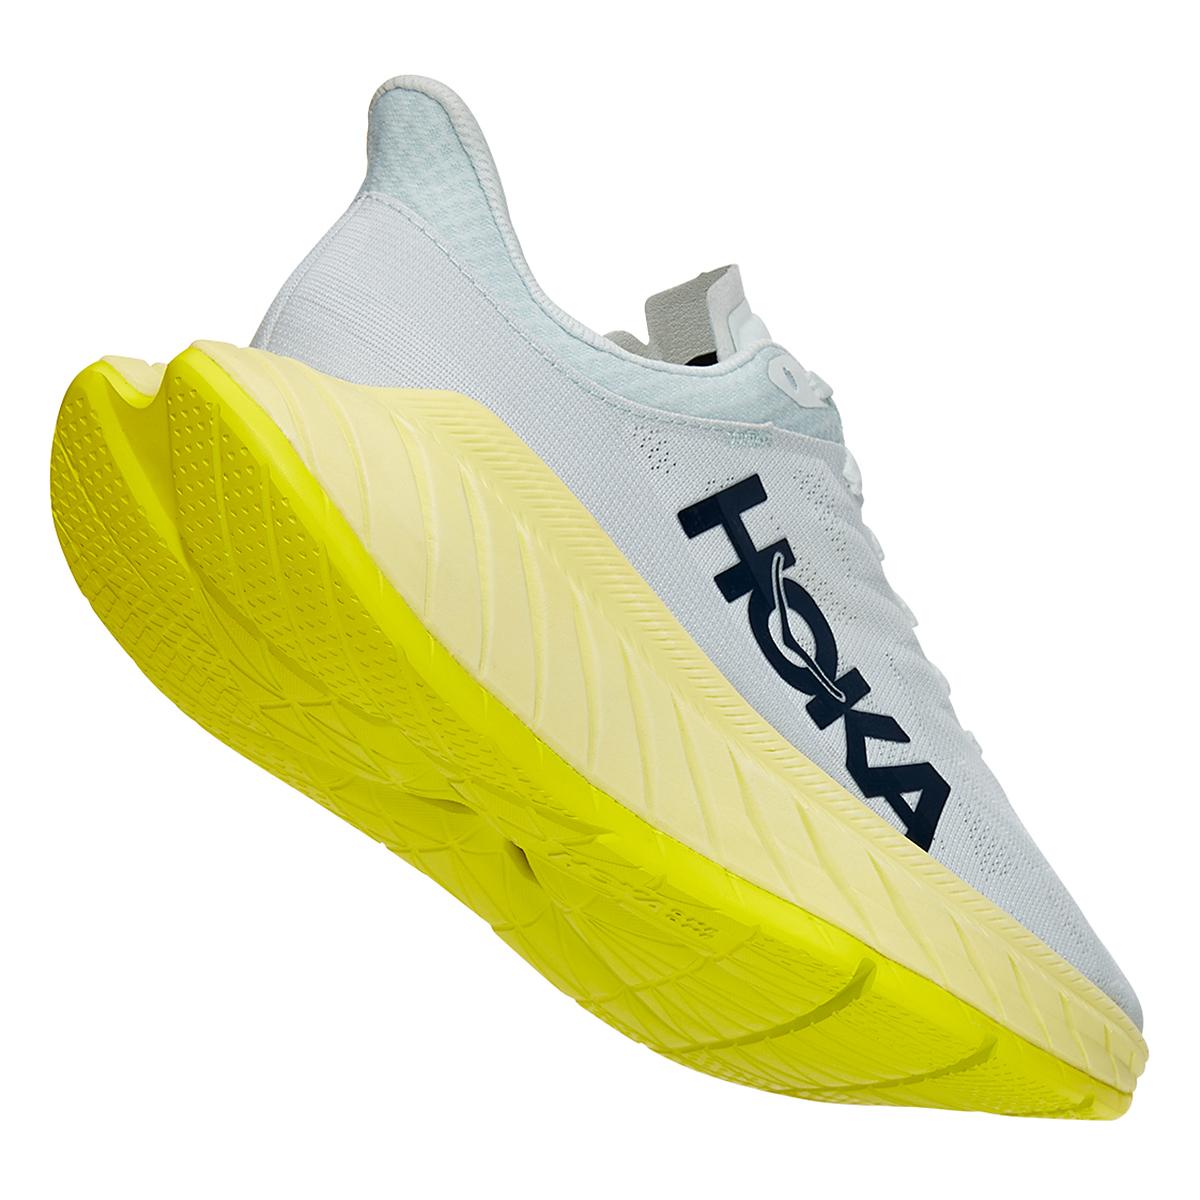 Women's Hoka One One Carbon X 2 Running Shoe - Color: Blue Flower/Luminary Green - Size: 5 - Width: Regular, Blue Flower/Luminary Green, large, image 3